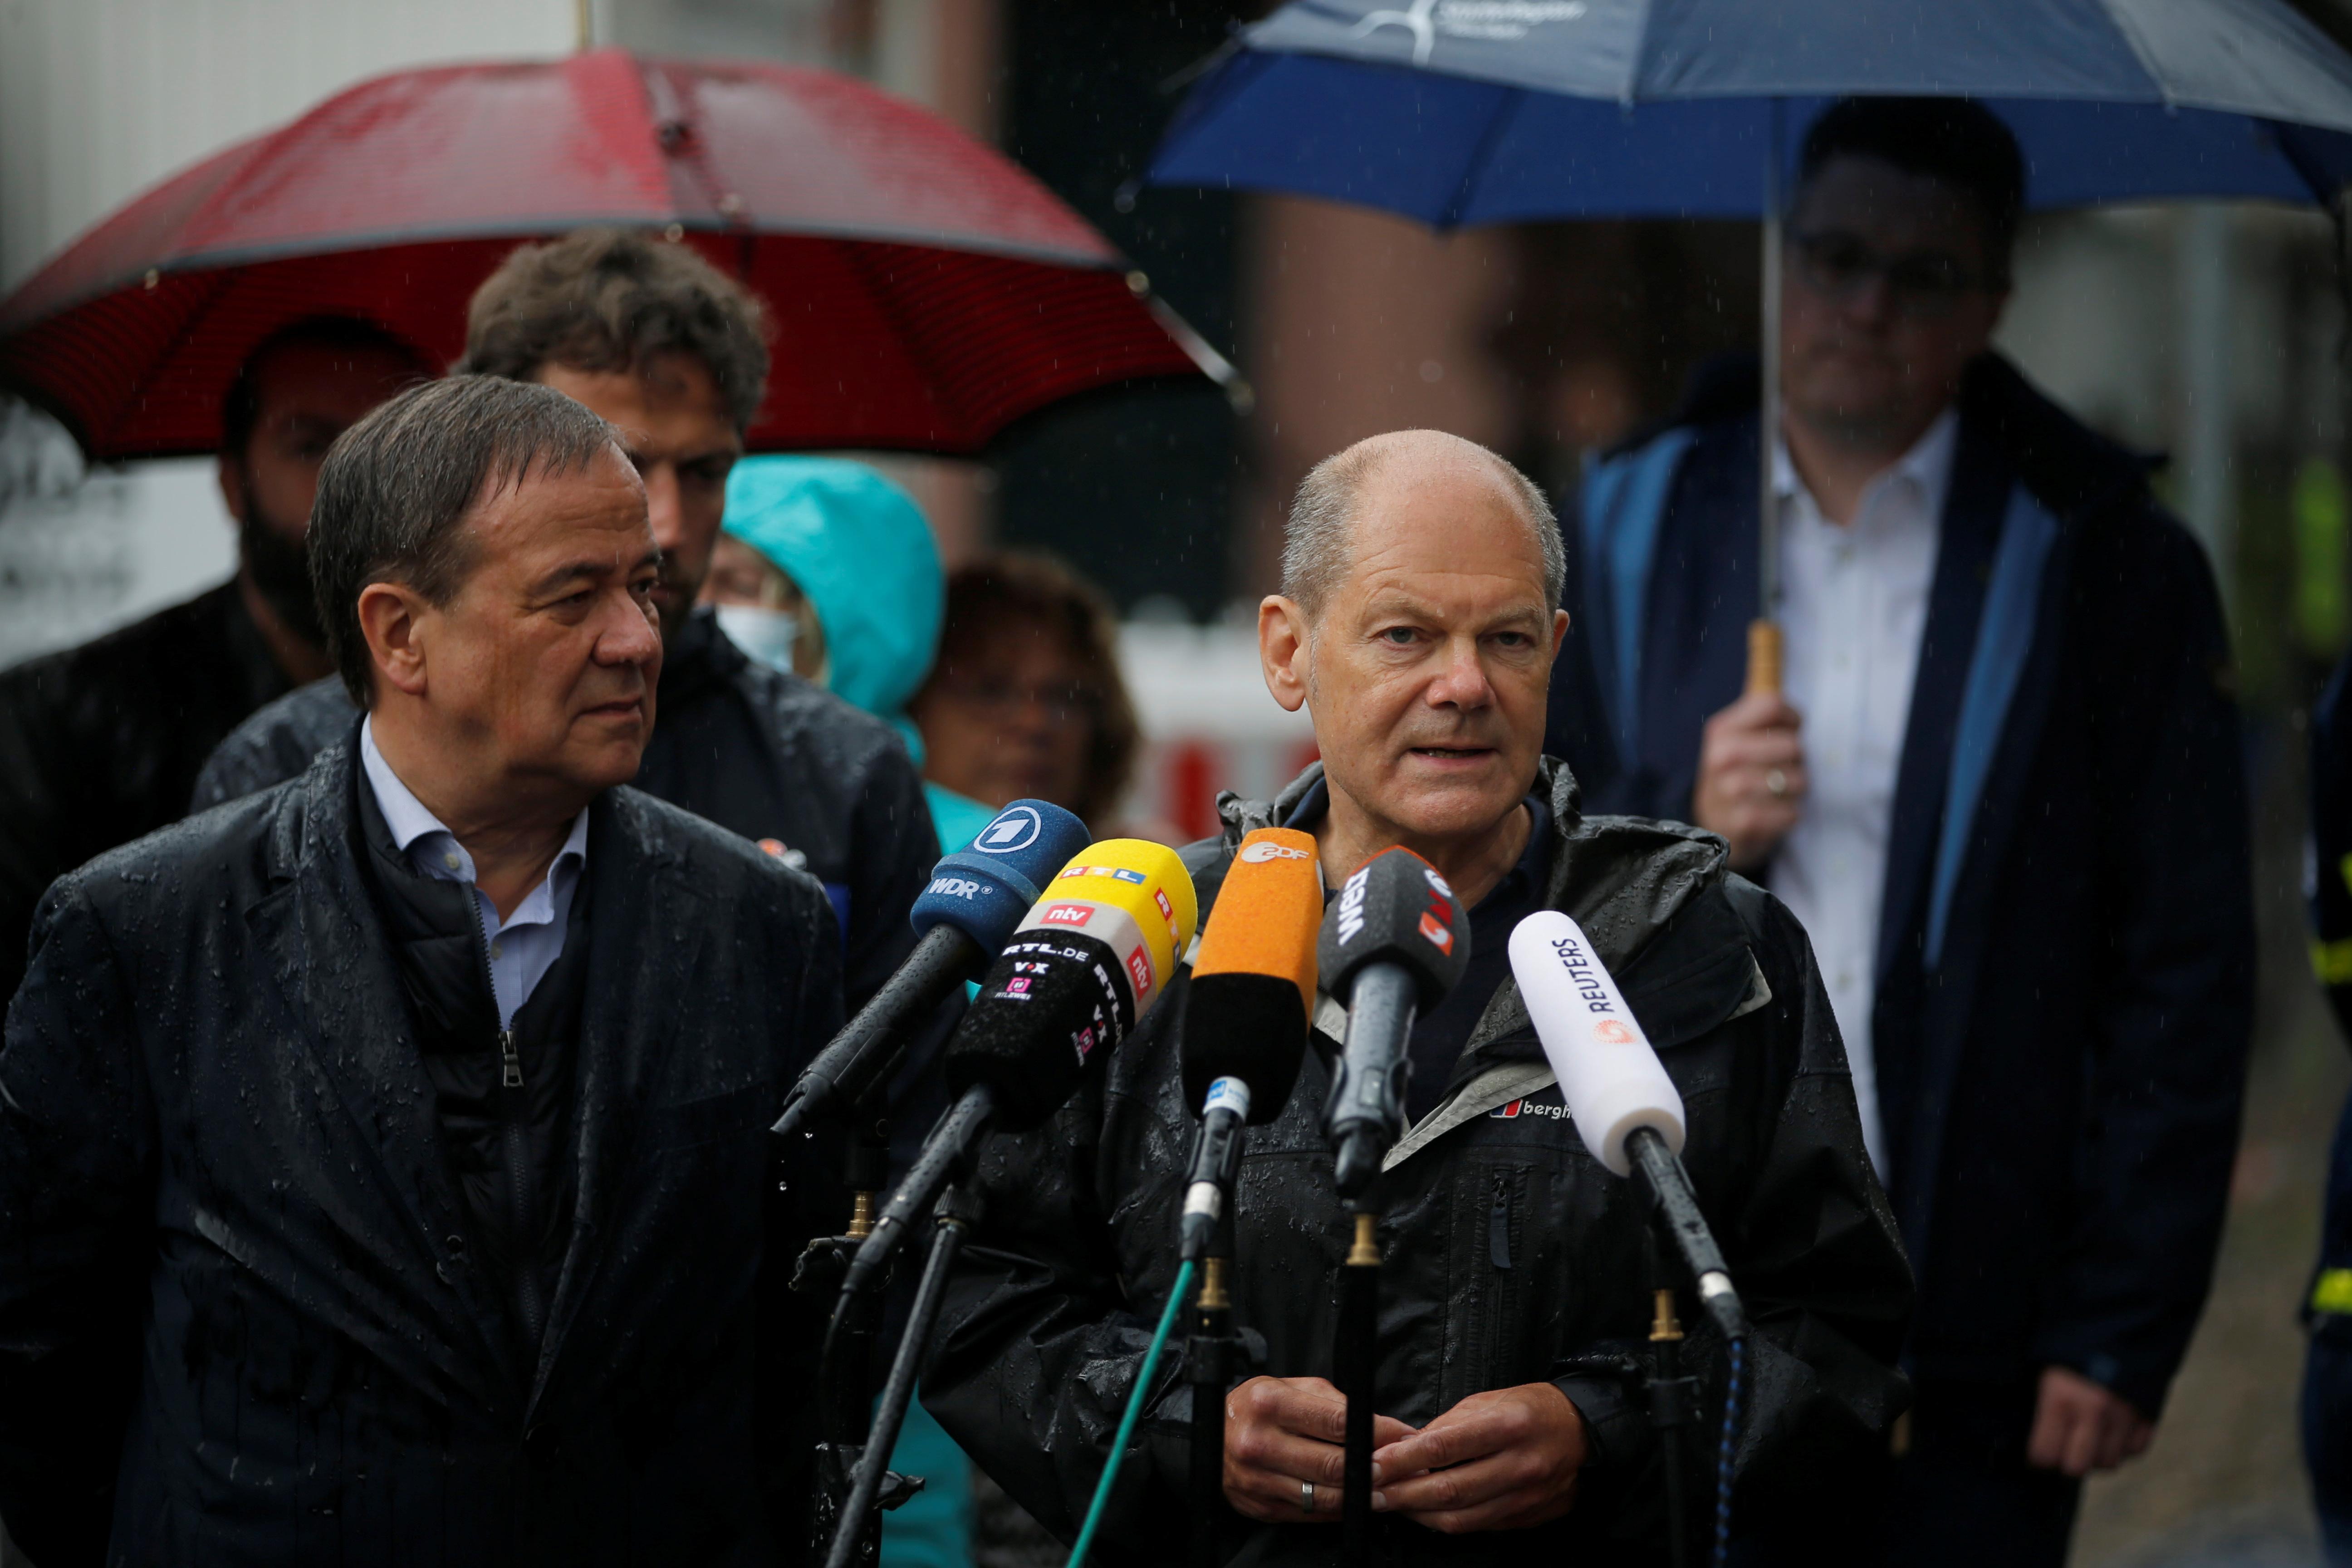 German Finance minister Olaf Scholz (SPD) speaks during a visit with Minister-president of German state Northrhine Westphalia, Armin Laschet (CDU) following heavy rainfalls in Stolberg, Germany, August 3, 2021. REUTERS/Leon Kuegeler